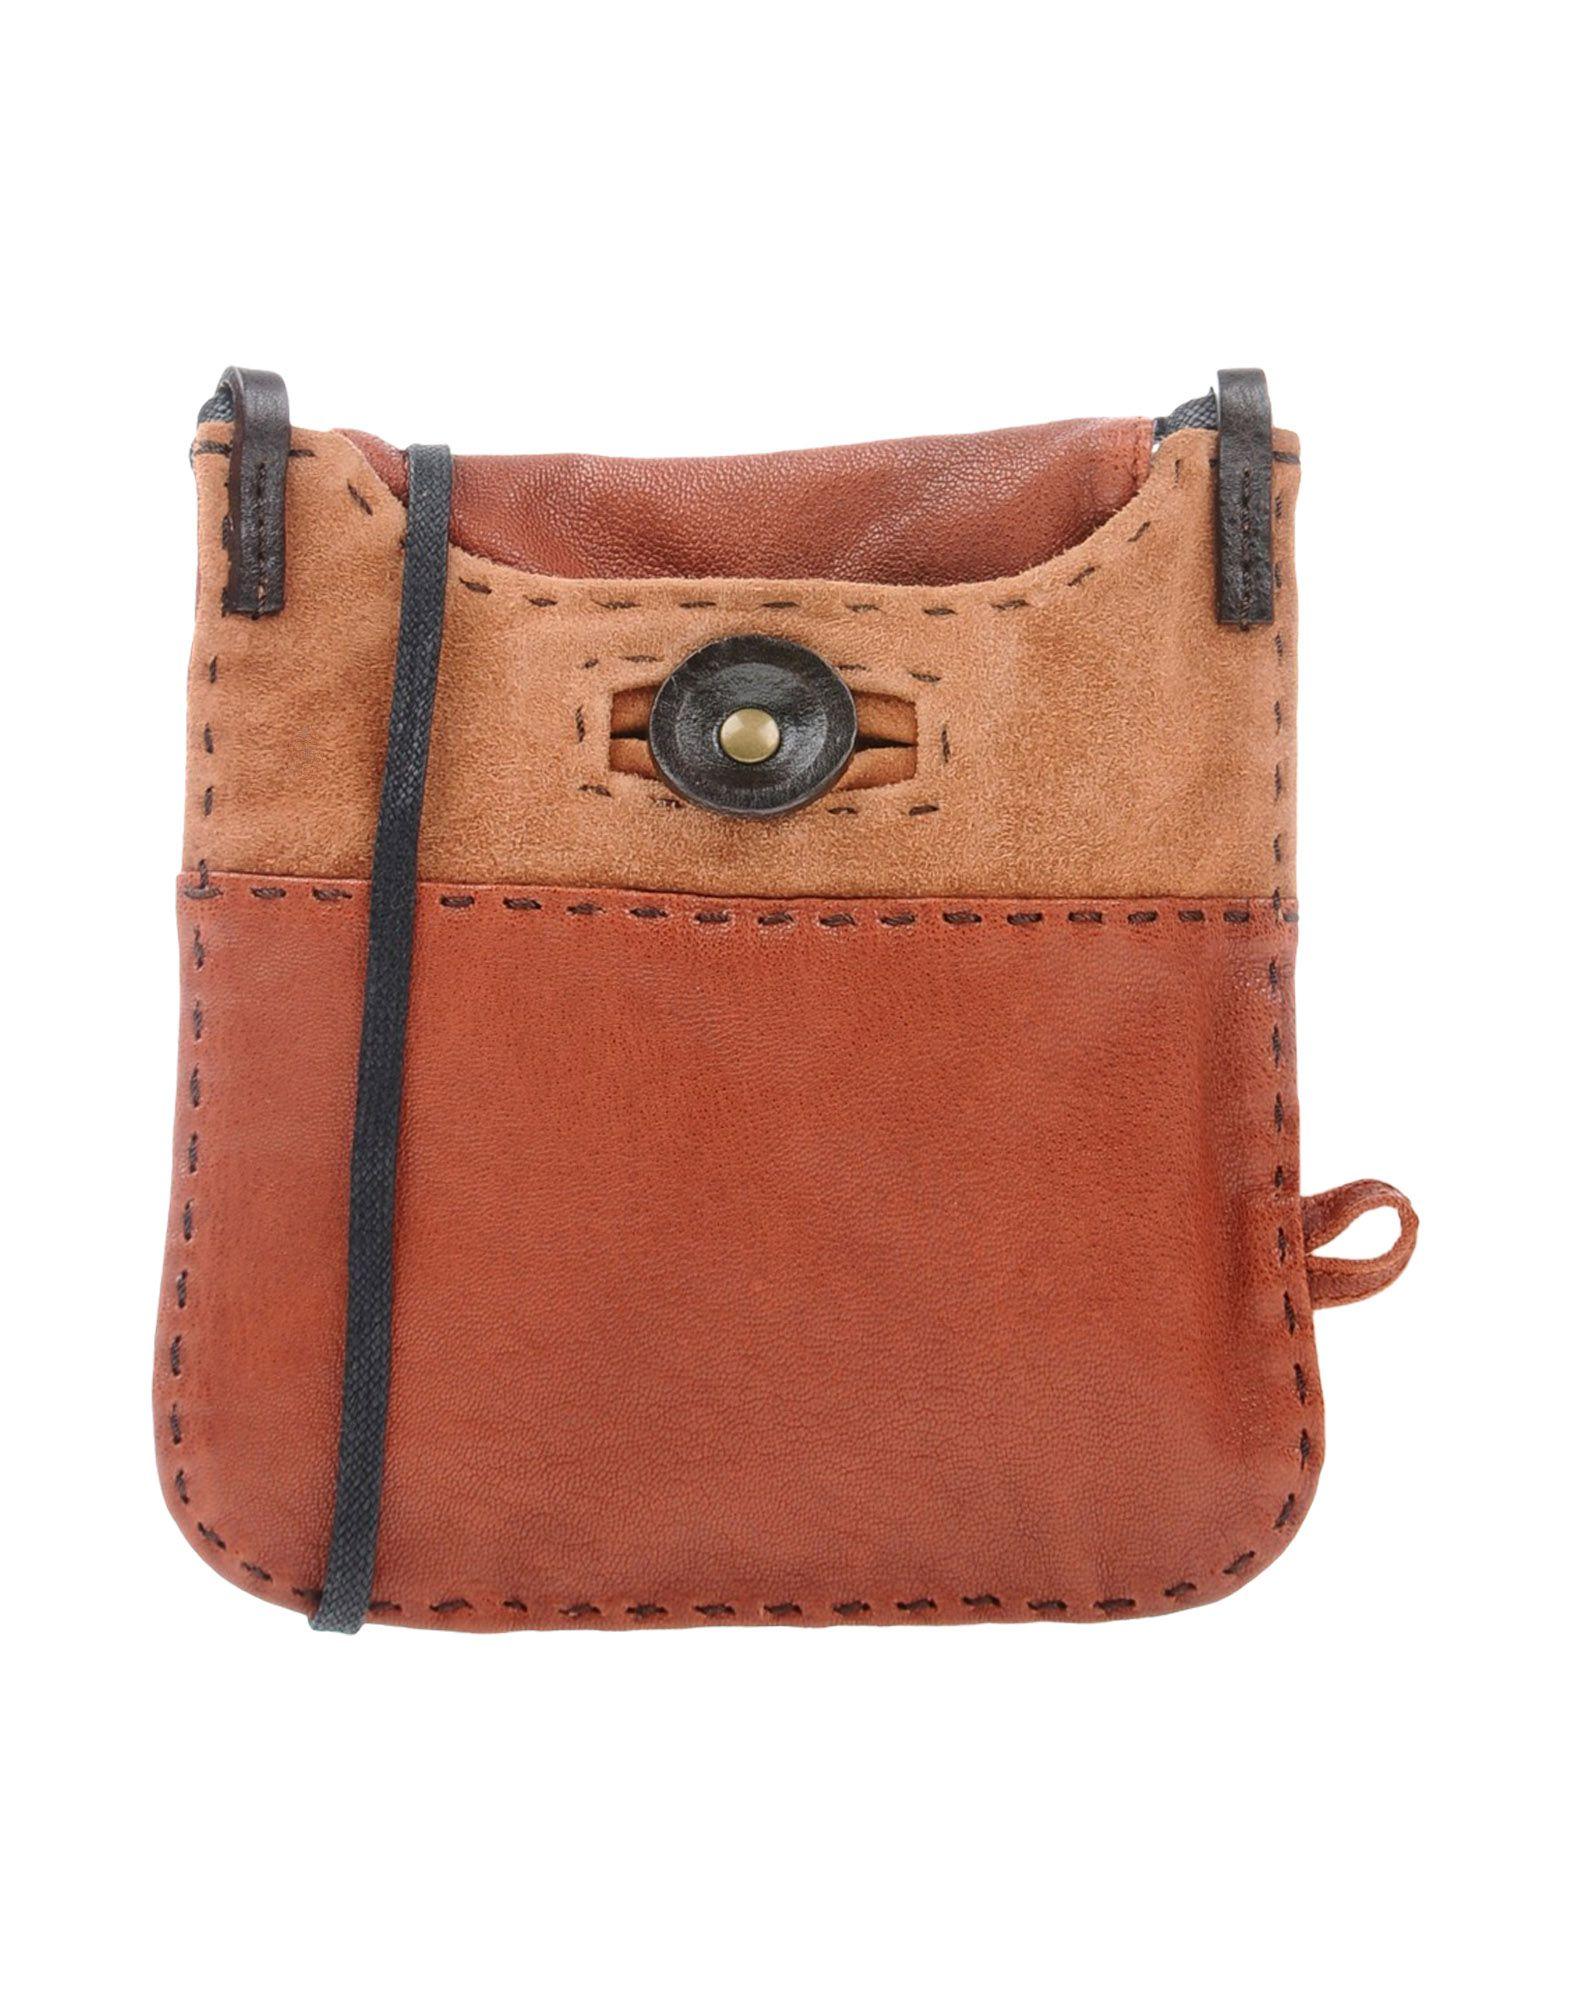 JAMIN PUECH Сумка через плечо сумка через плечо famous brand 2015 pu zb 252